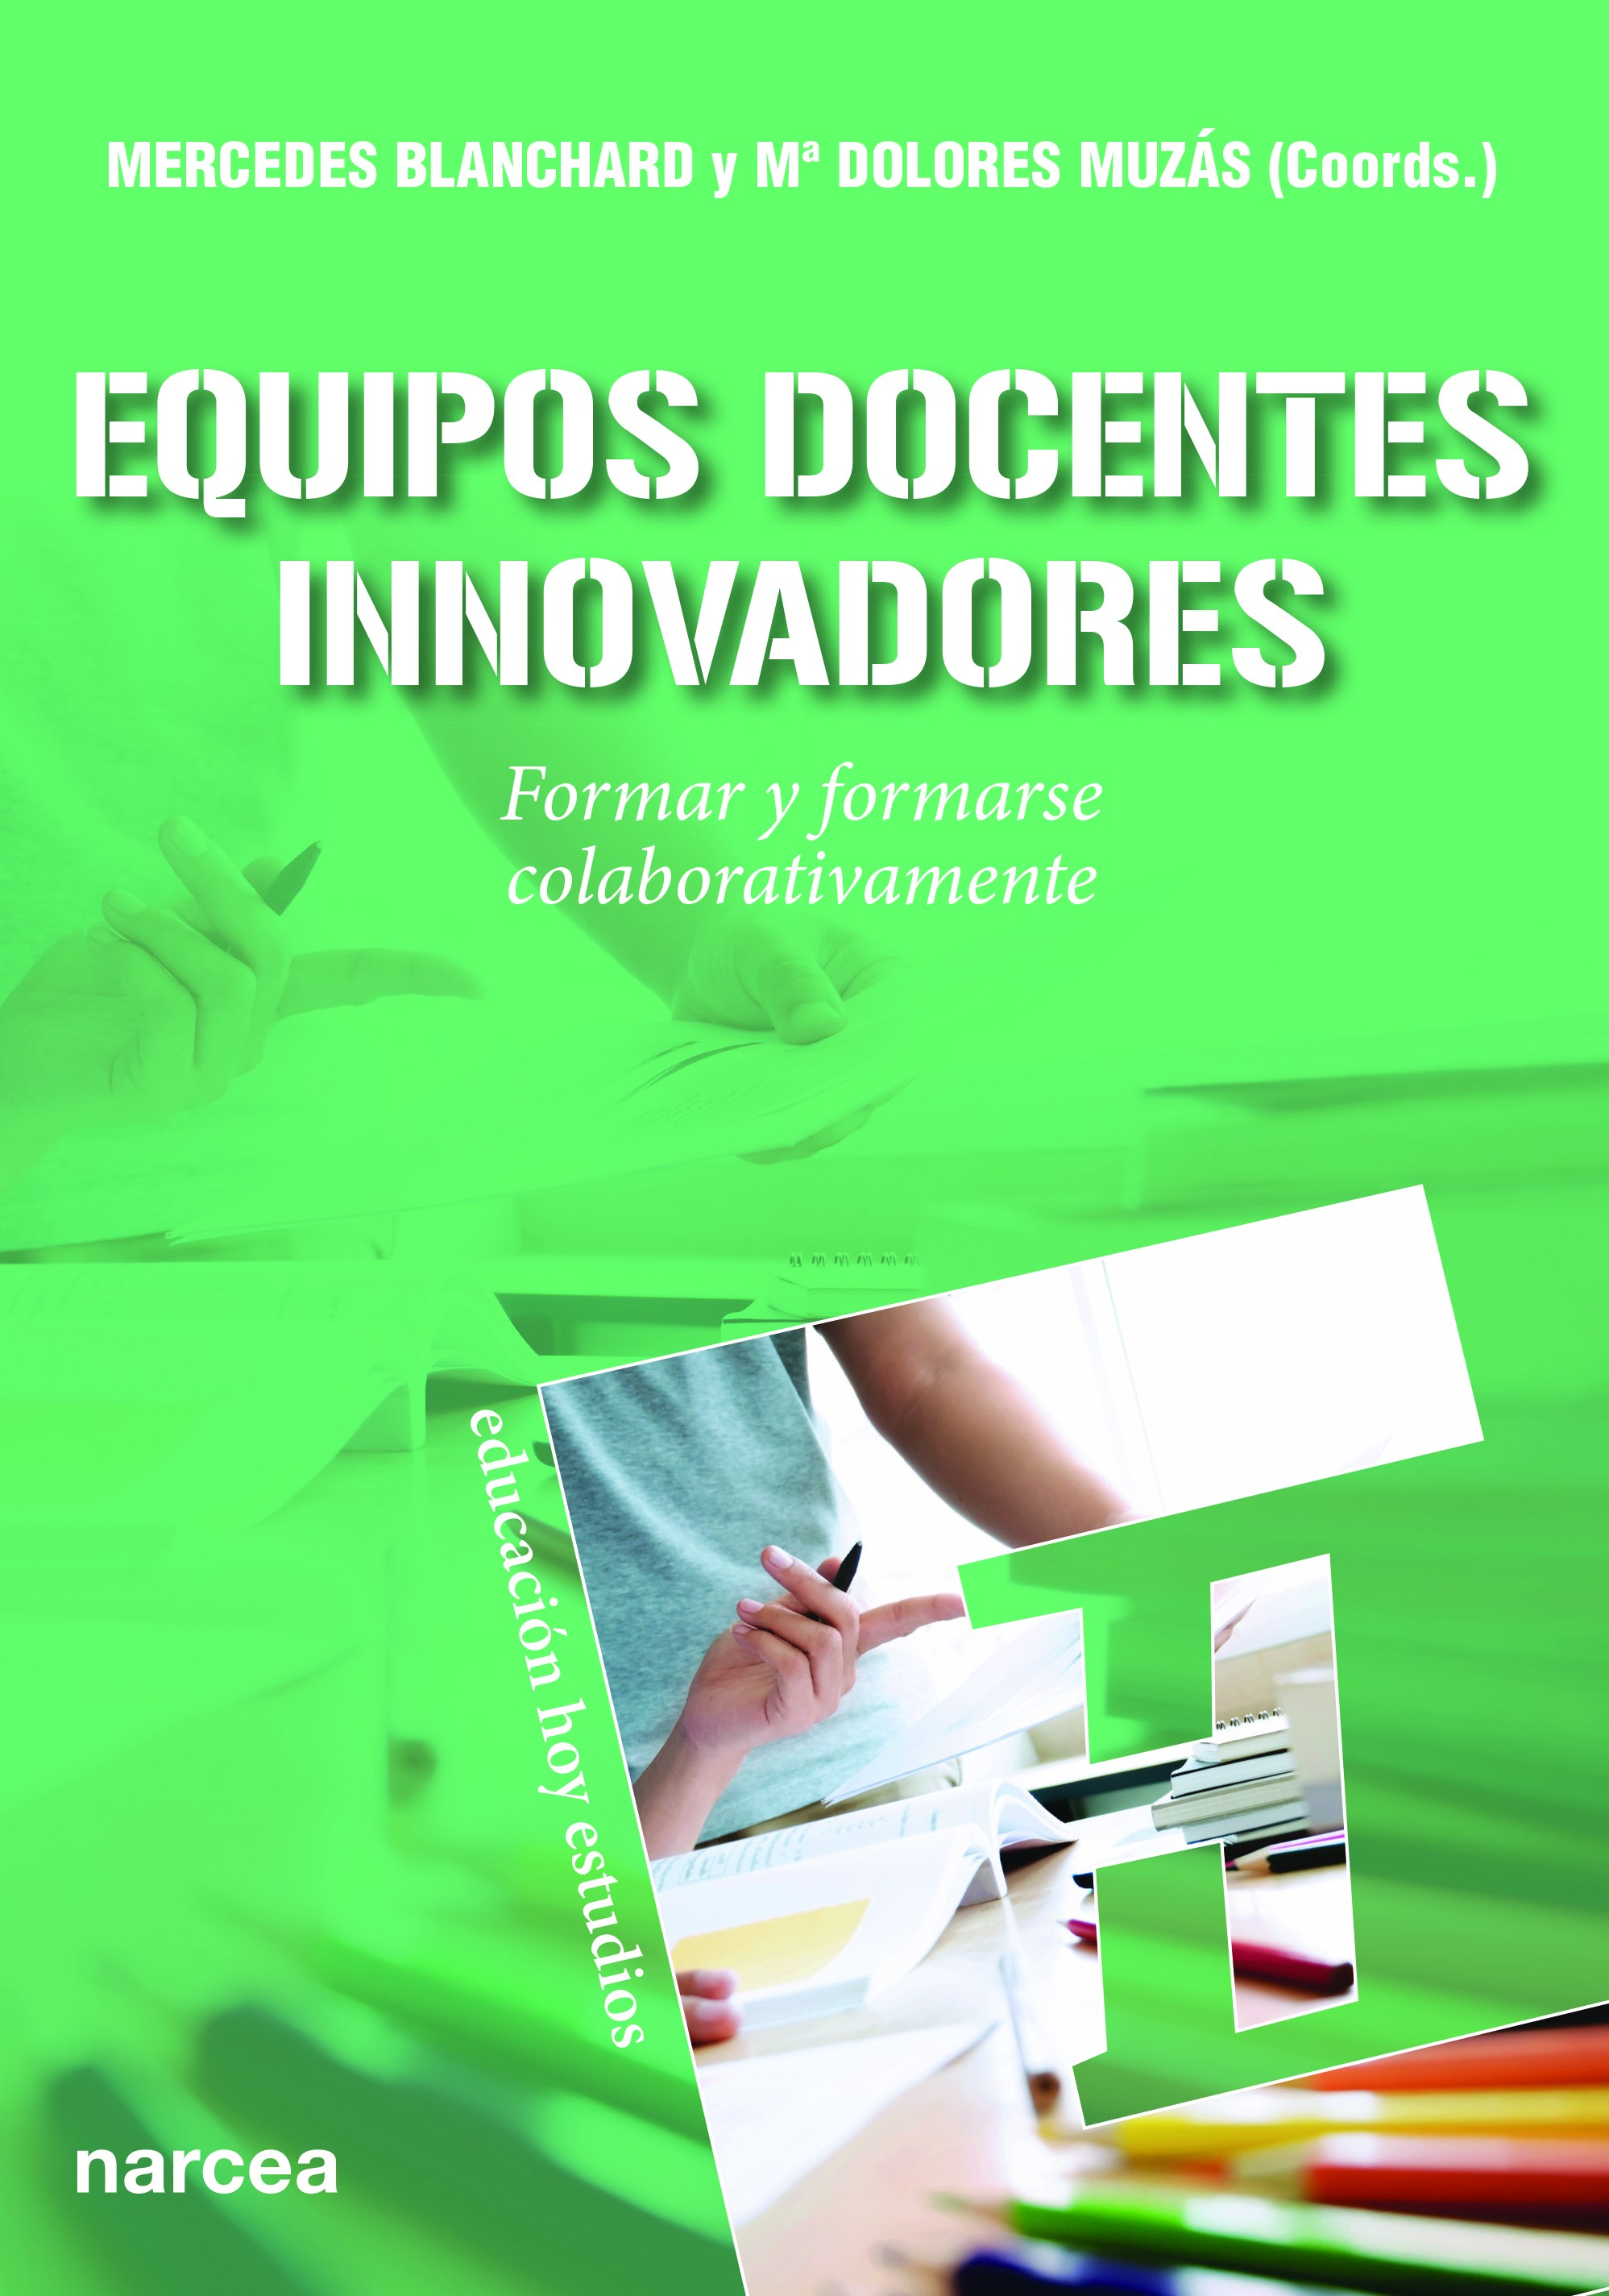 Equipos docentes innovadores